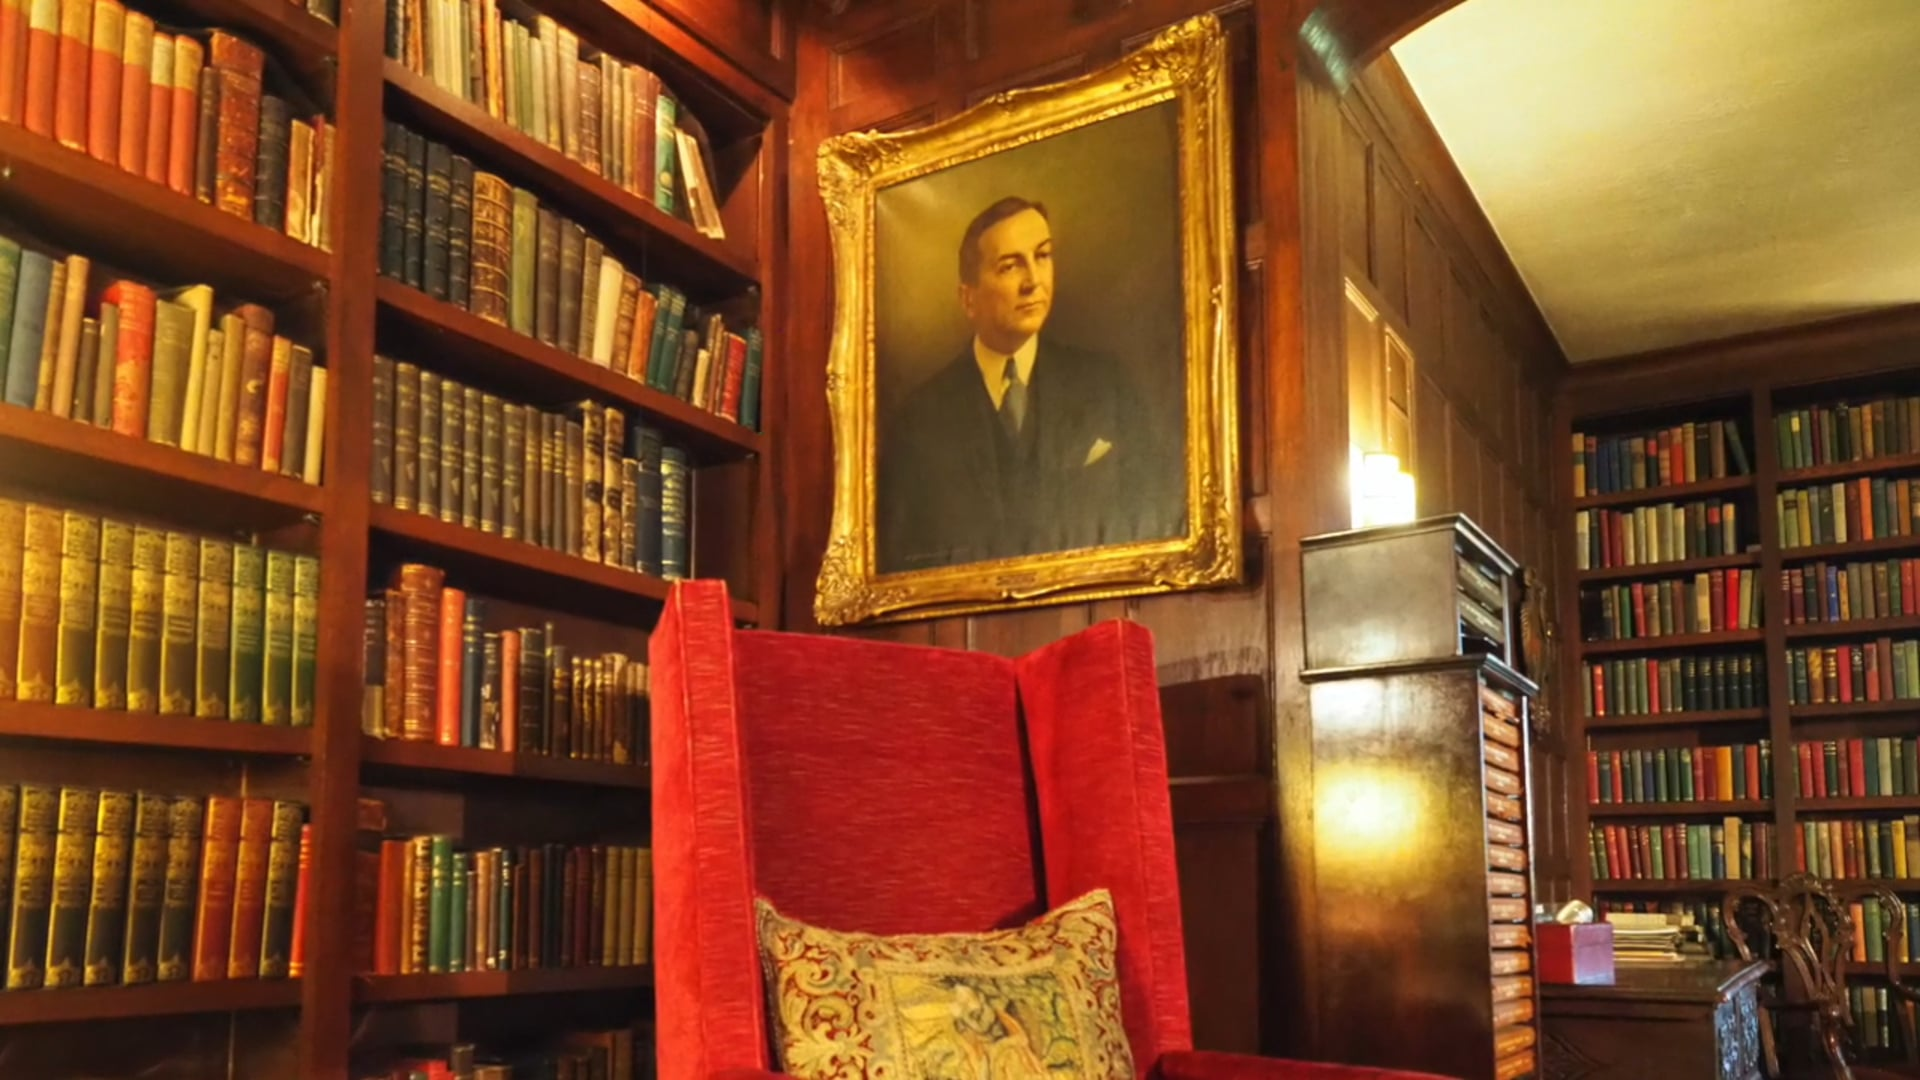 Portrait of T. C. Williams Jr.